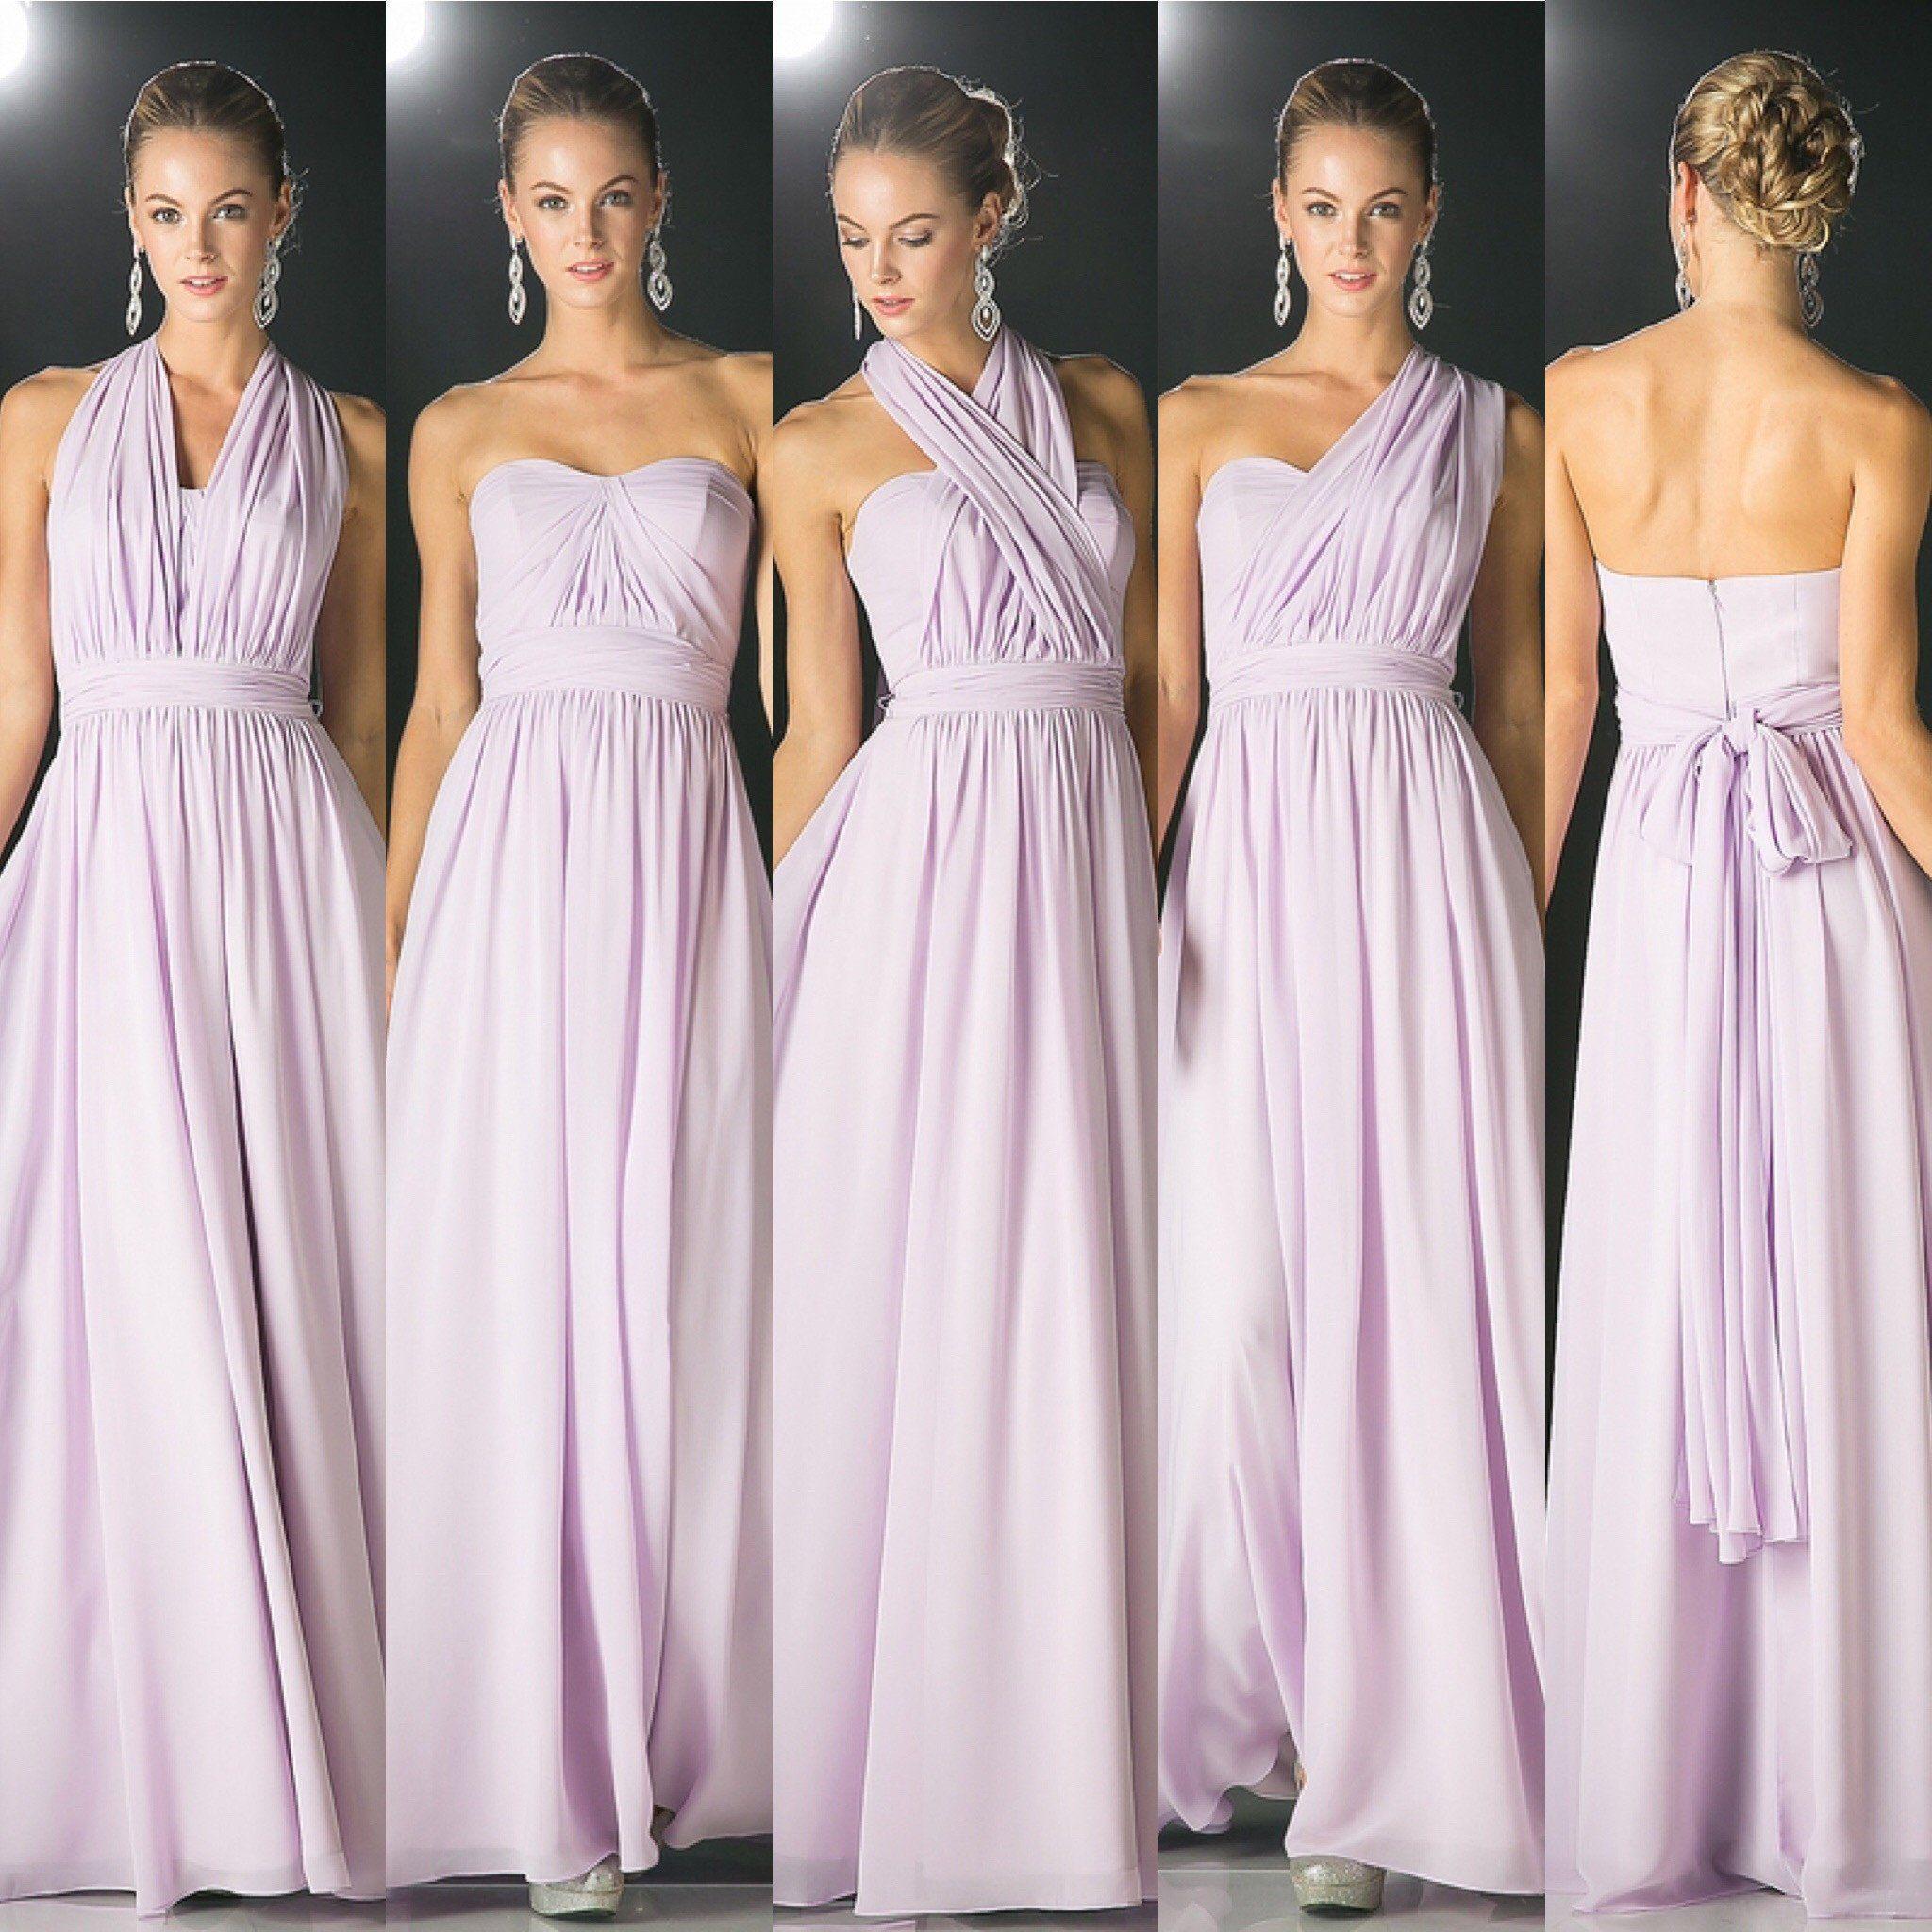 Affordable Versatile Floor Length Convertible Bridesmaid Dress 7 Colors Xs 3xl Lilac Bridesmaid Dresses Convertible Bridesmaid Dress Cheap Bridesmaid Dresses